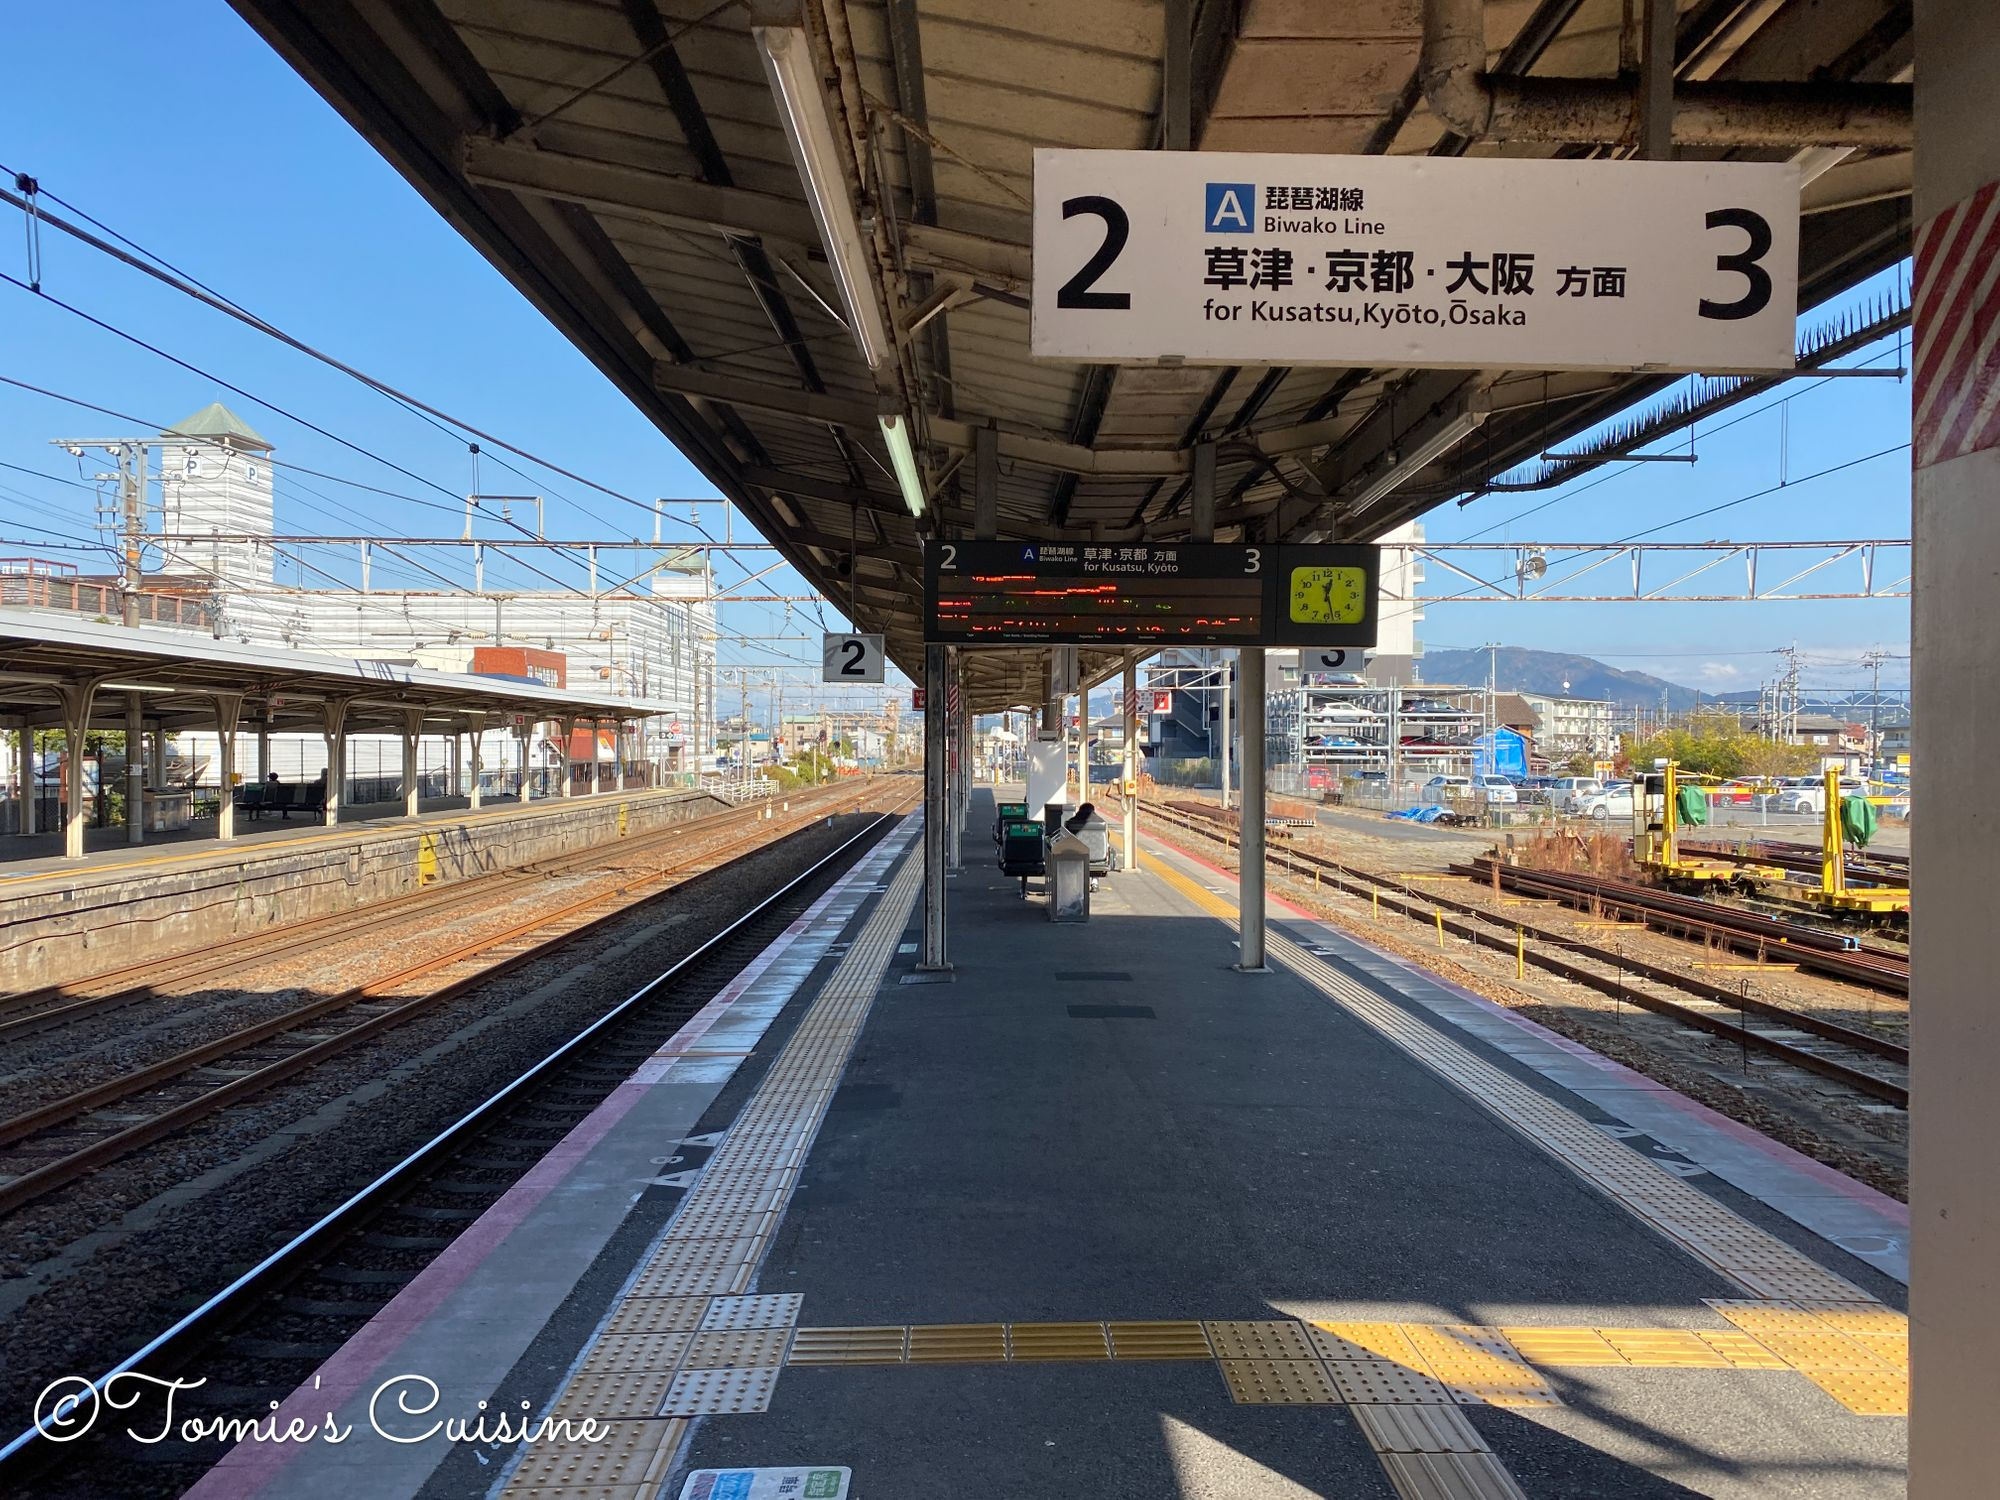 Omihachiman train station